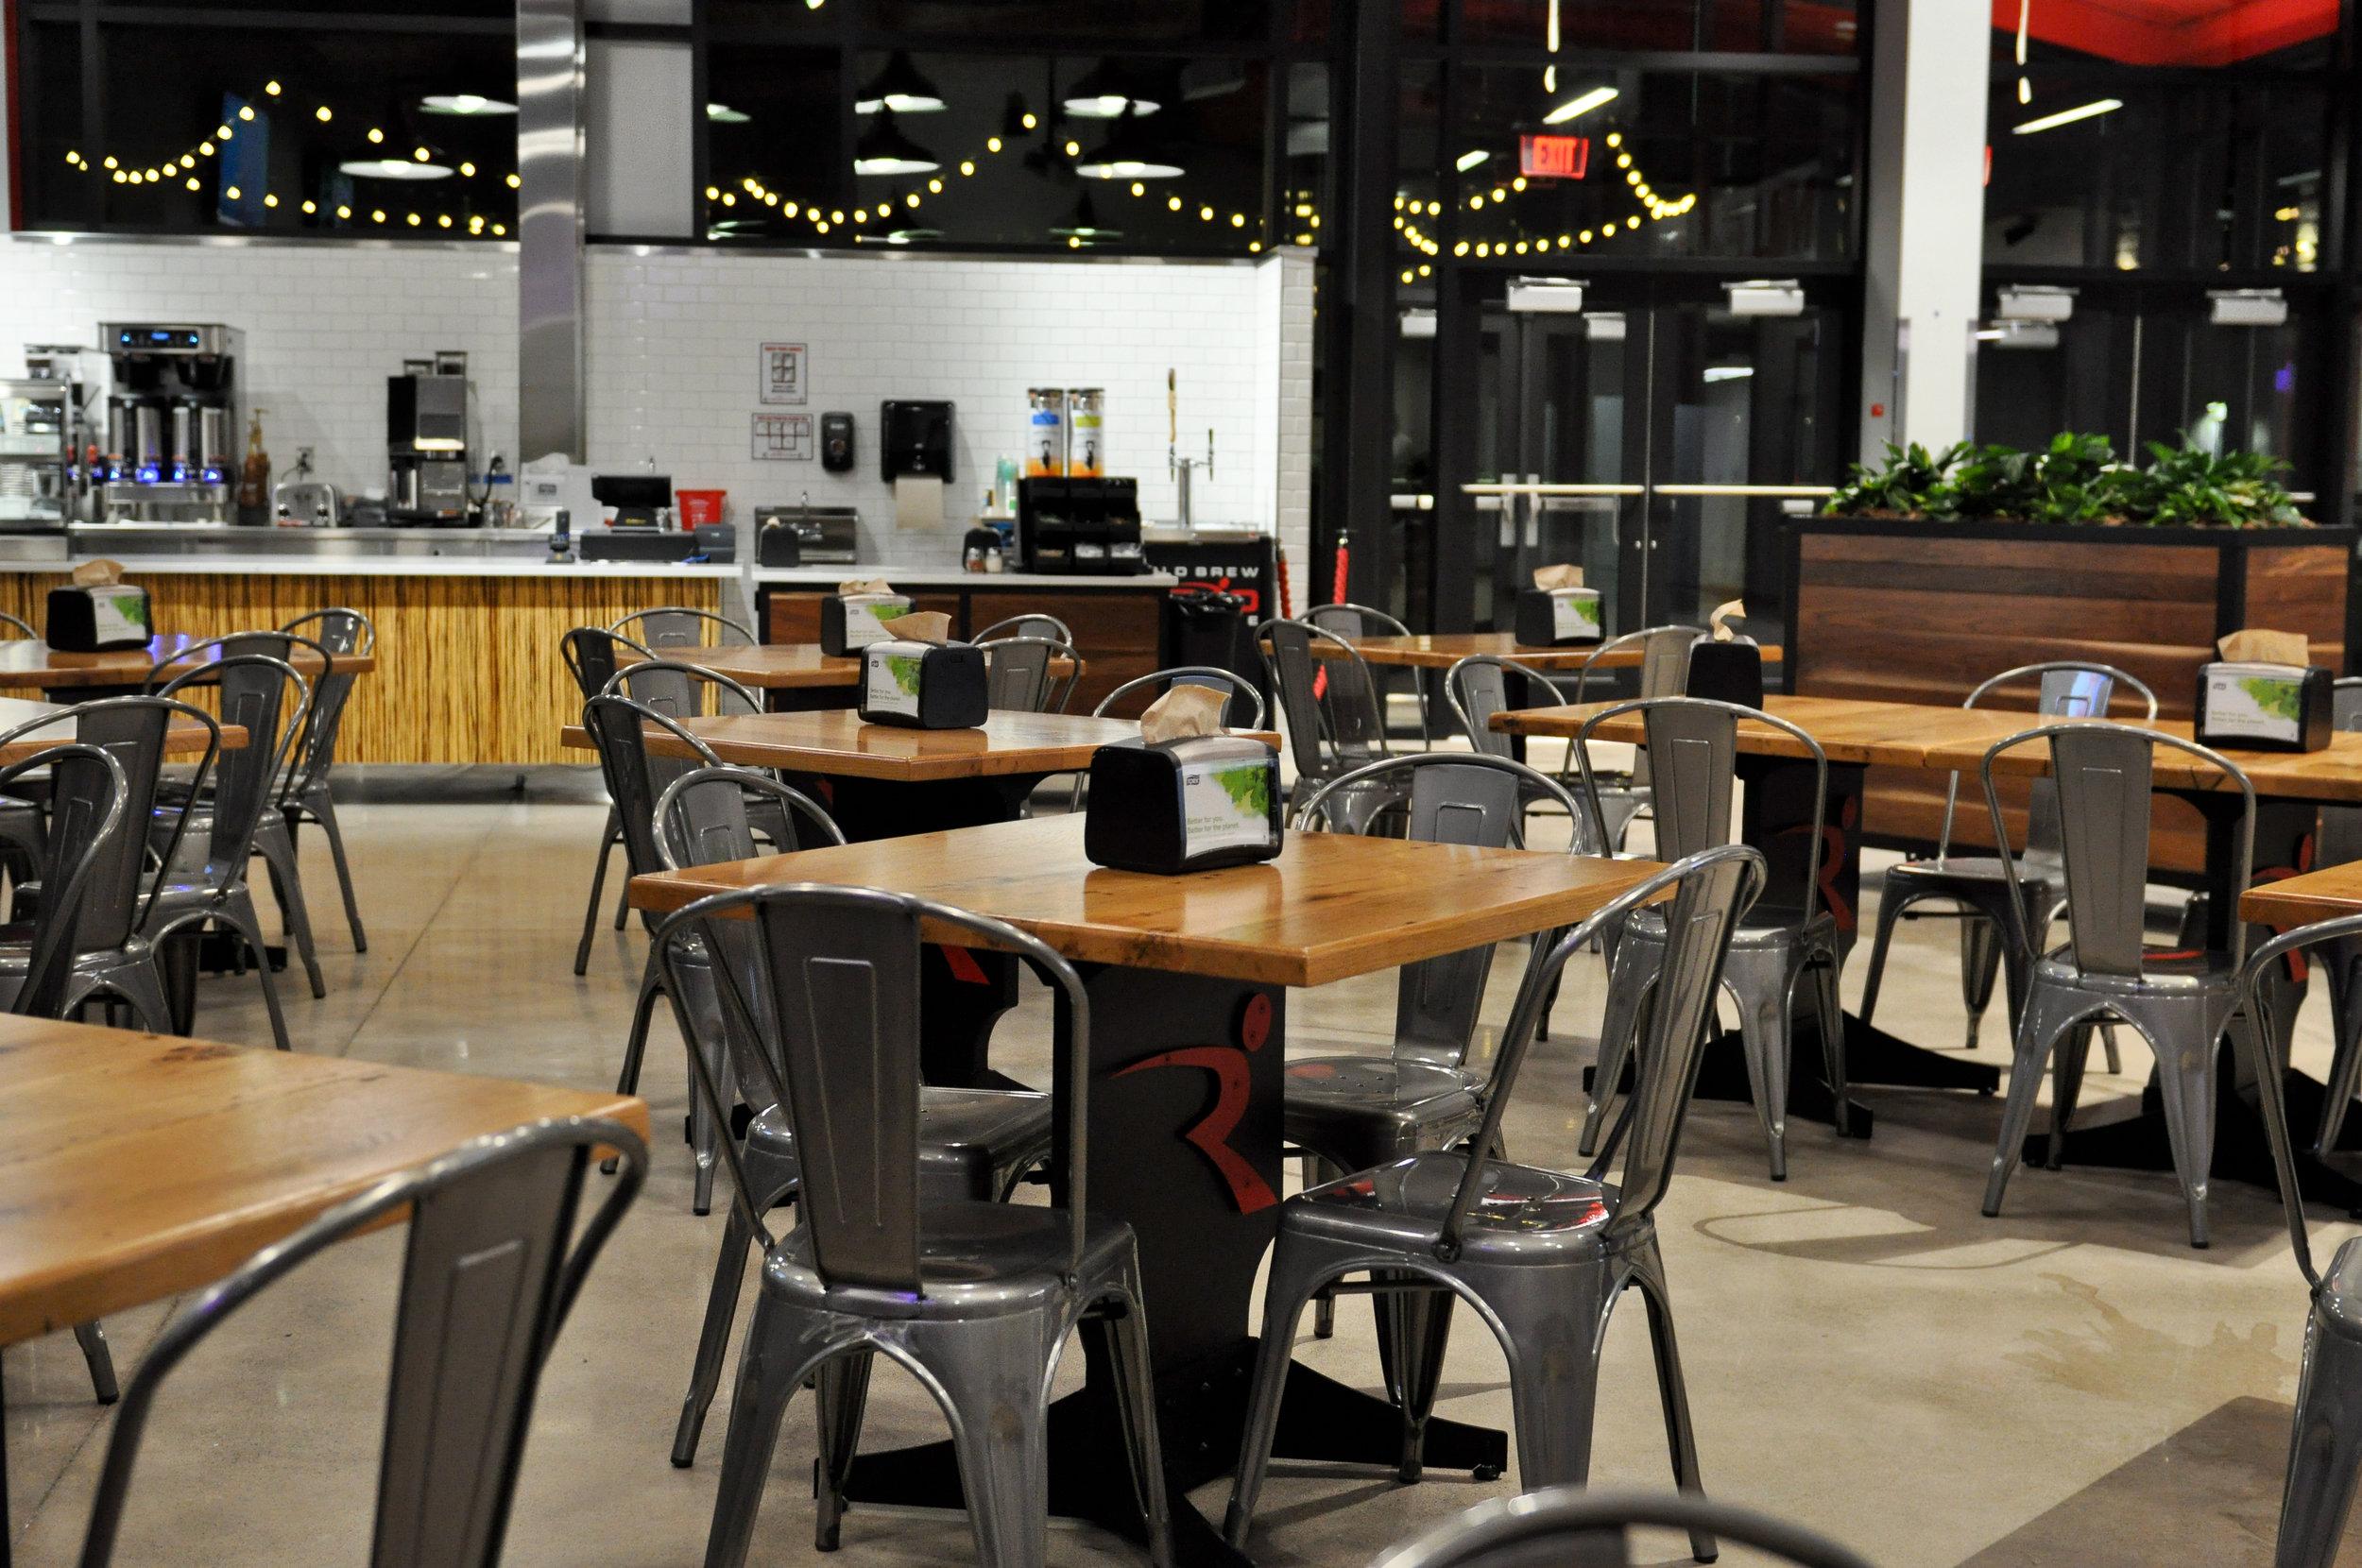 bespoke furniture, custom handmade dining table